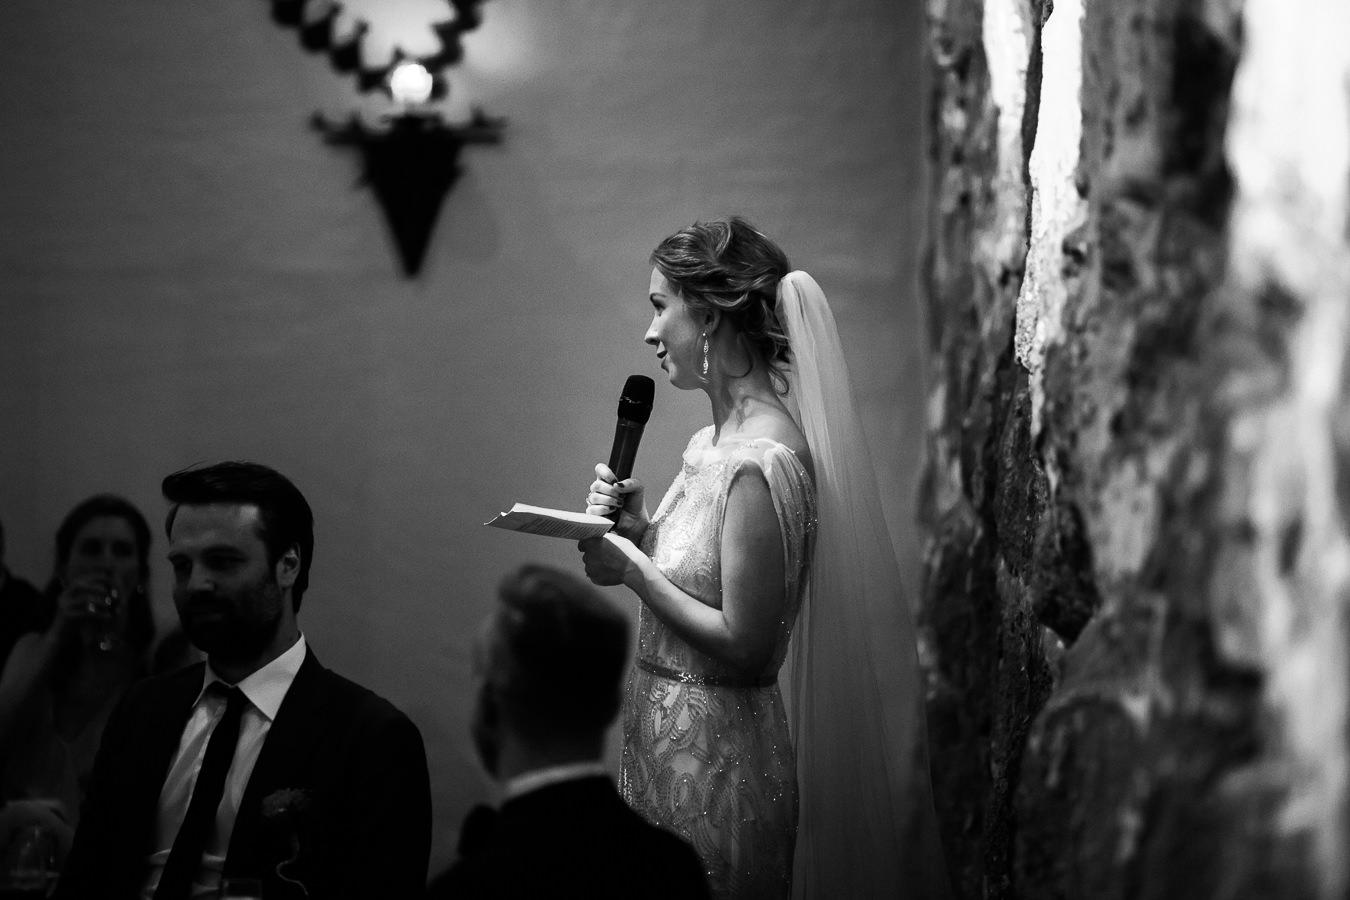 Tone-Tvedt-bryllup-fotograf-månefisken-135.jpg